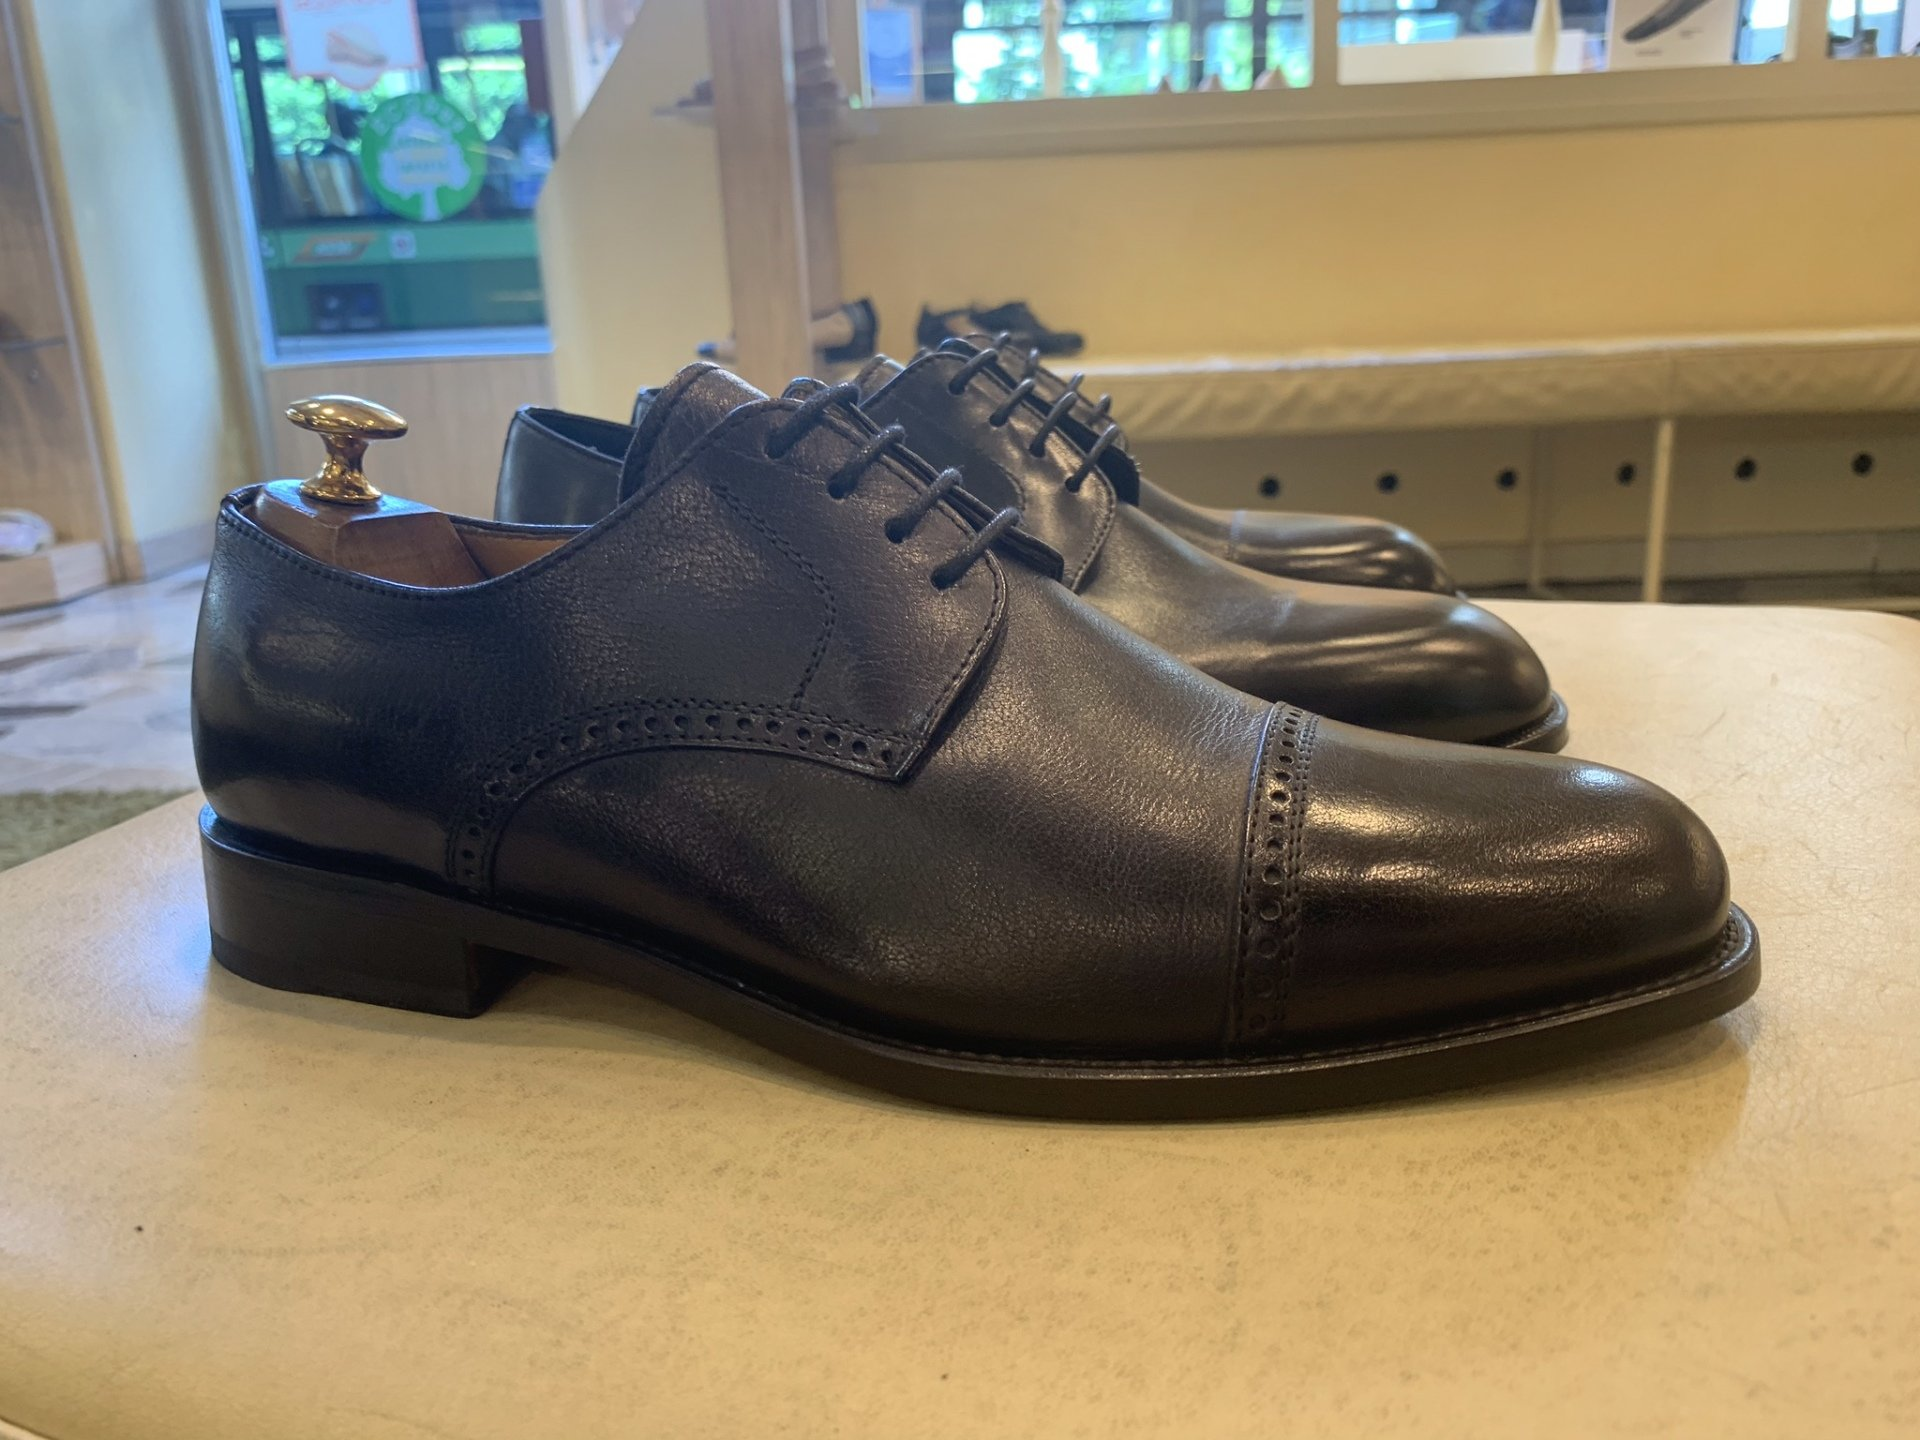 Scarpe artigianali da uomo - Milano - Tury Calzature